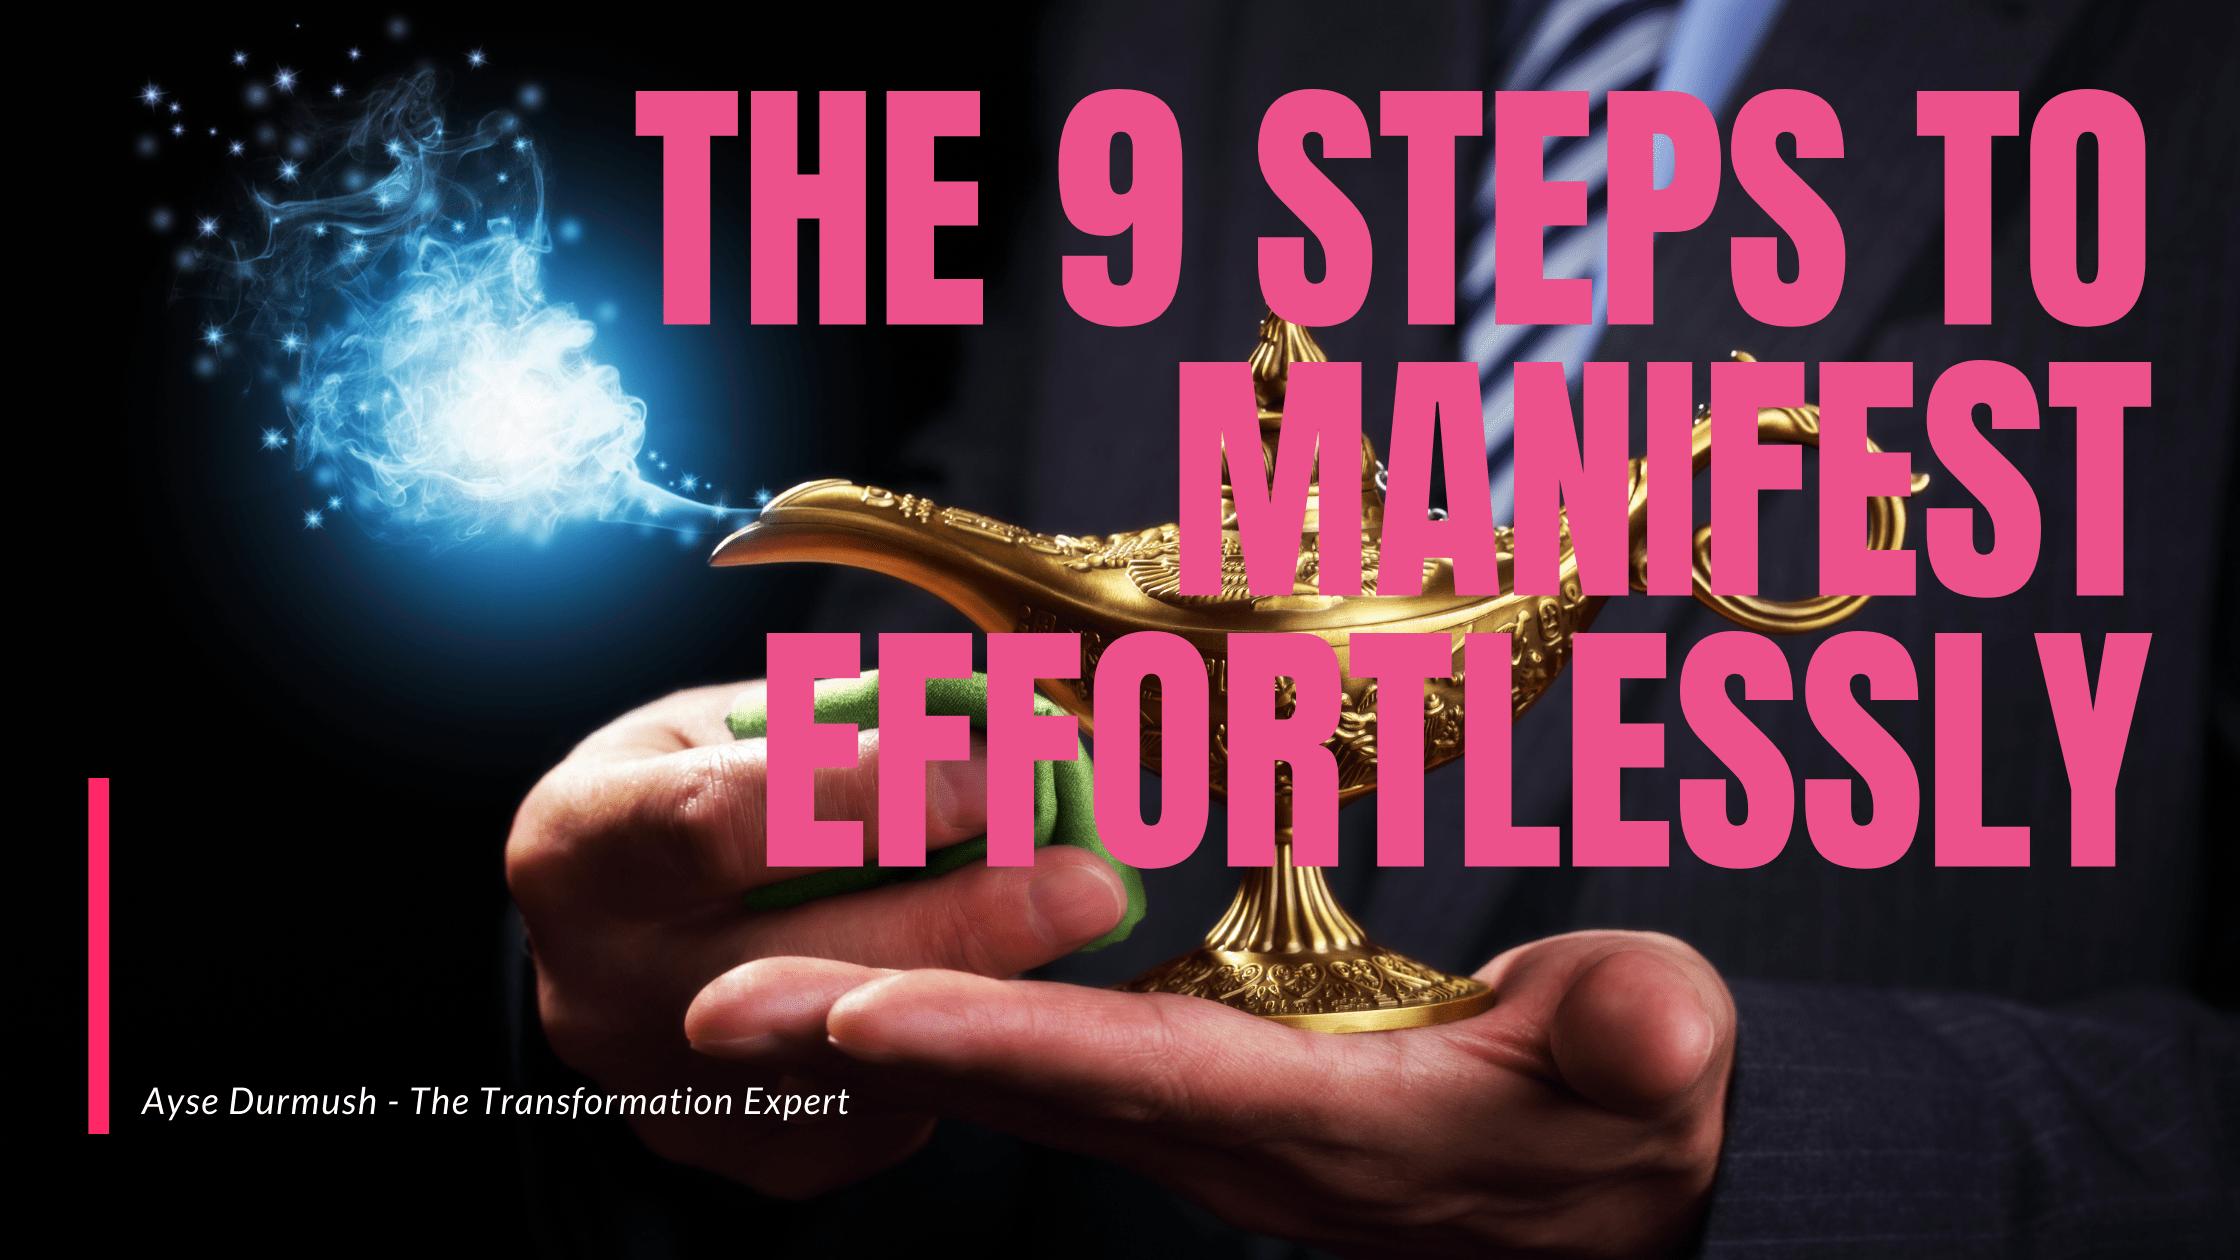 The 9 Steps to Manifest Effortlessly